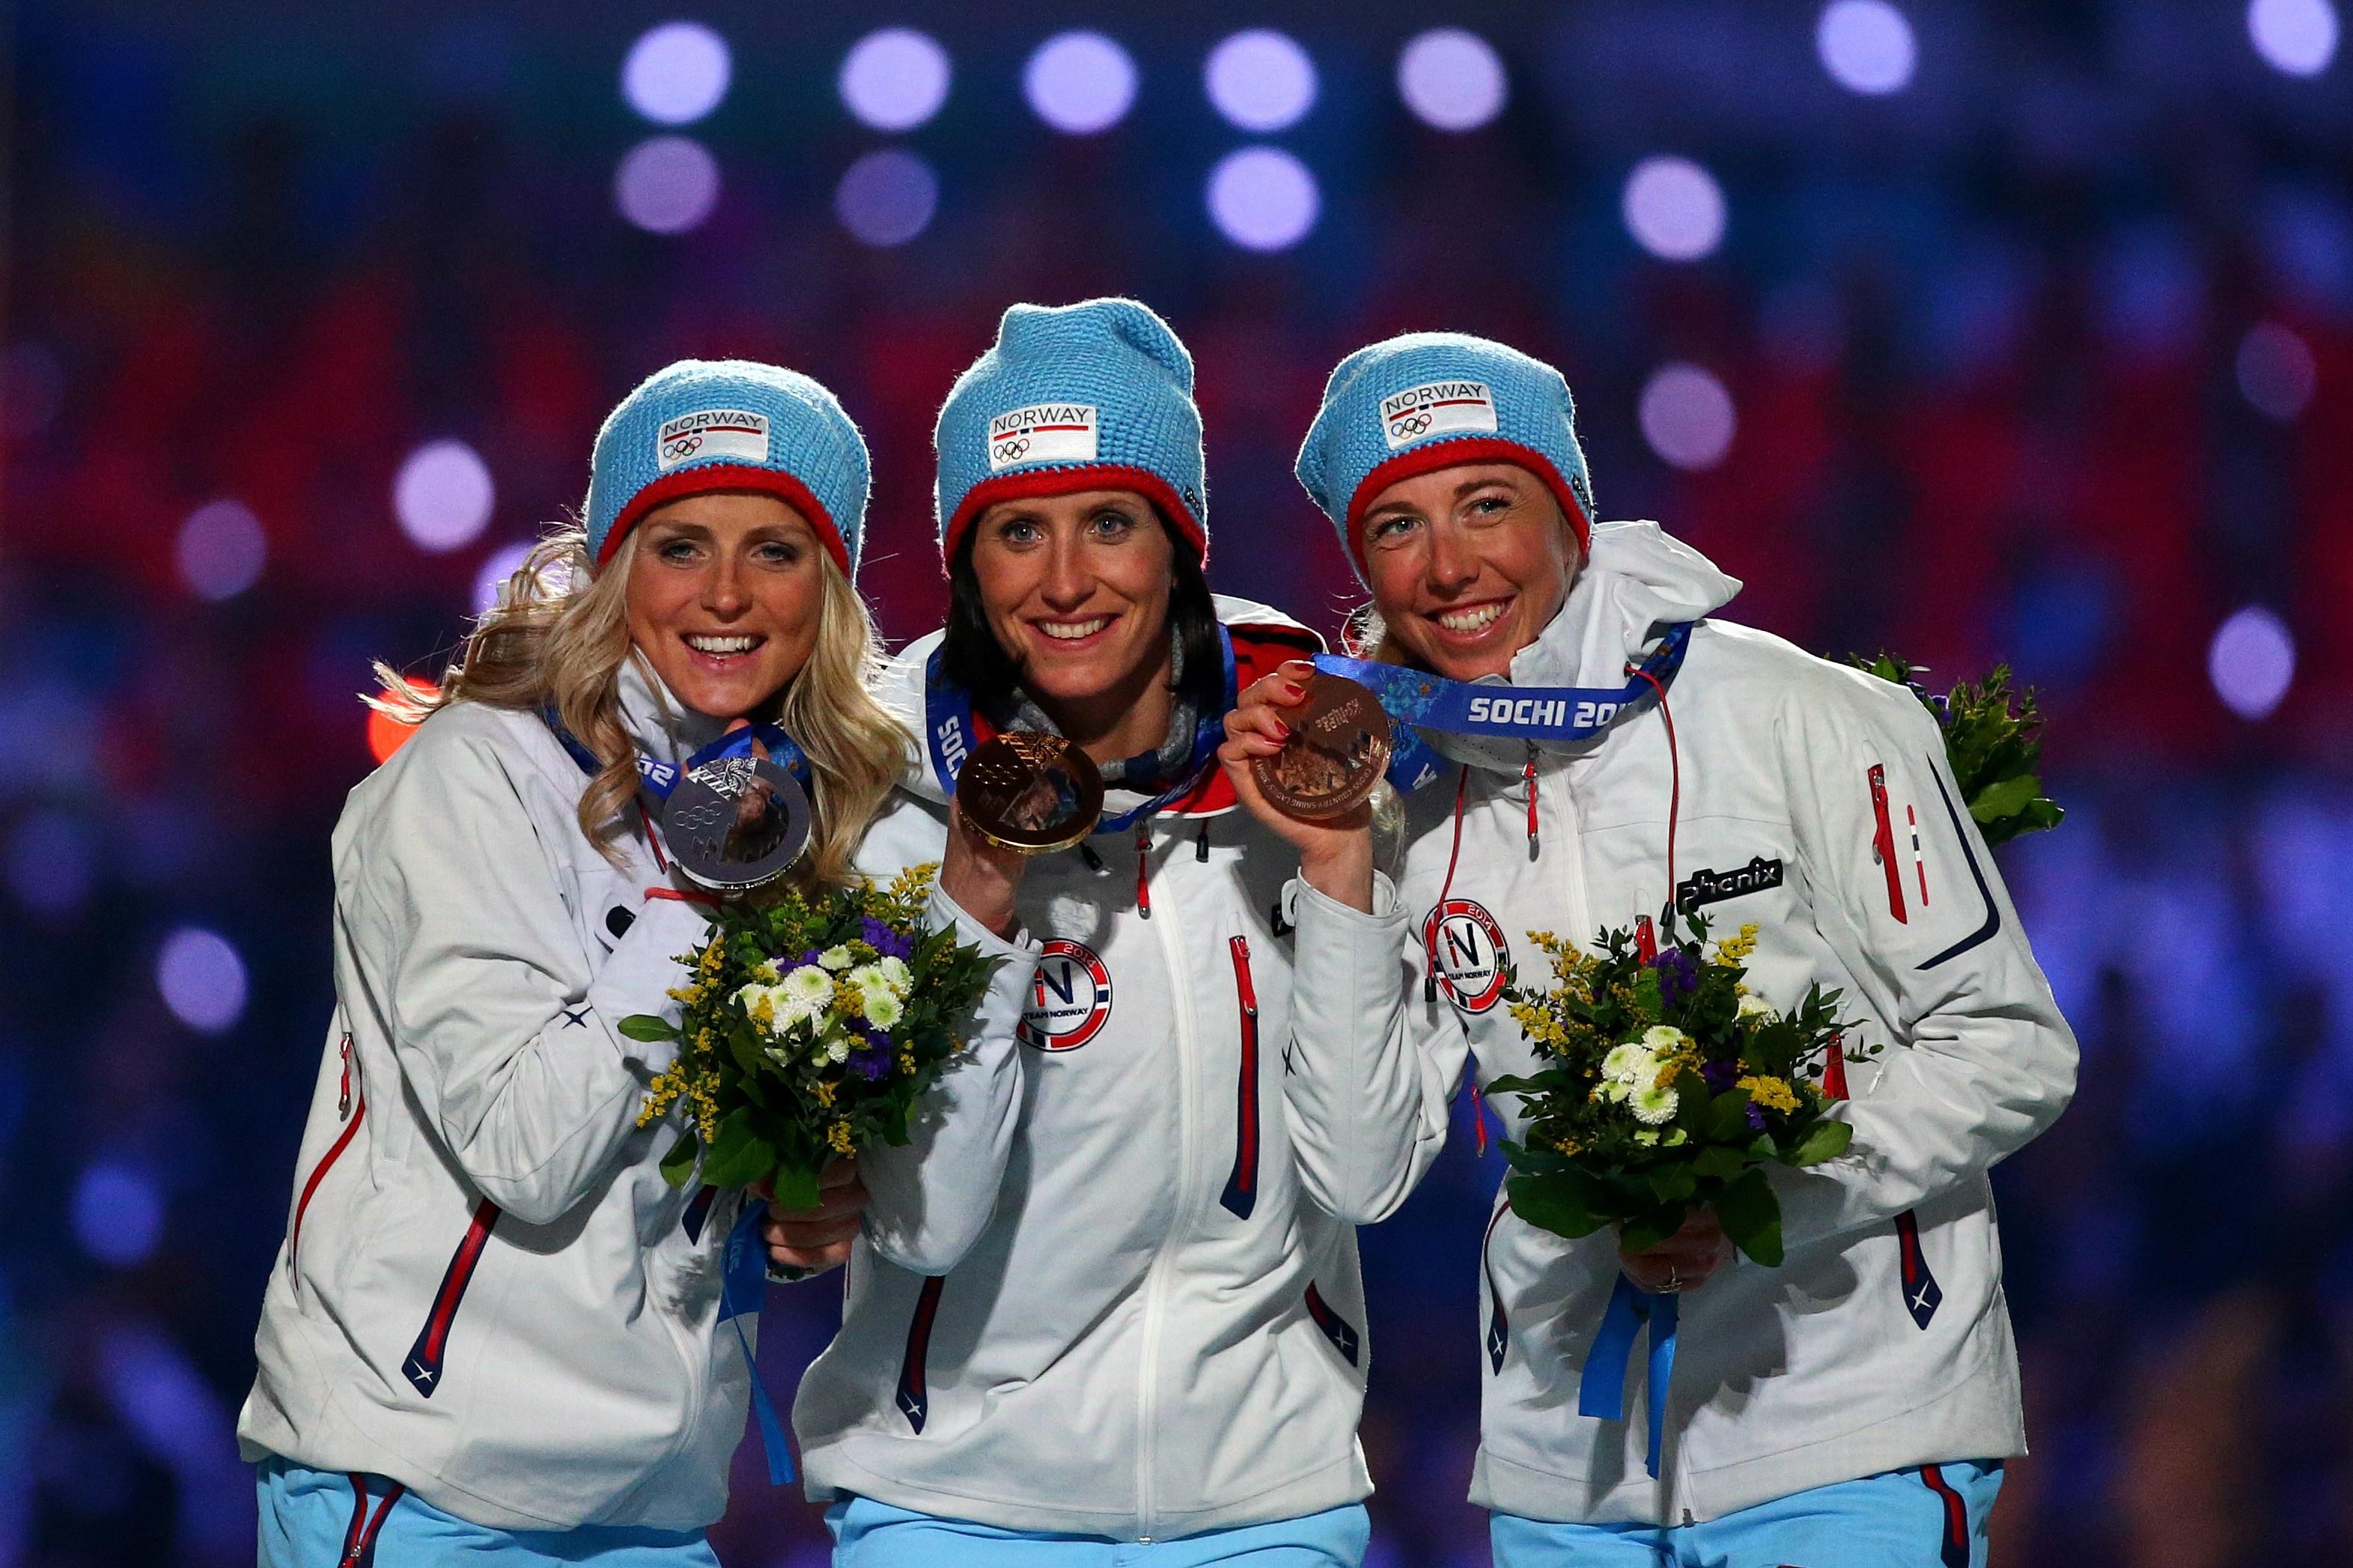 Днем конституции, картинки с олимпиады 2014